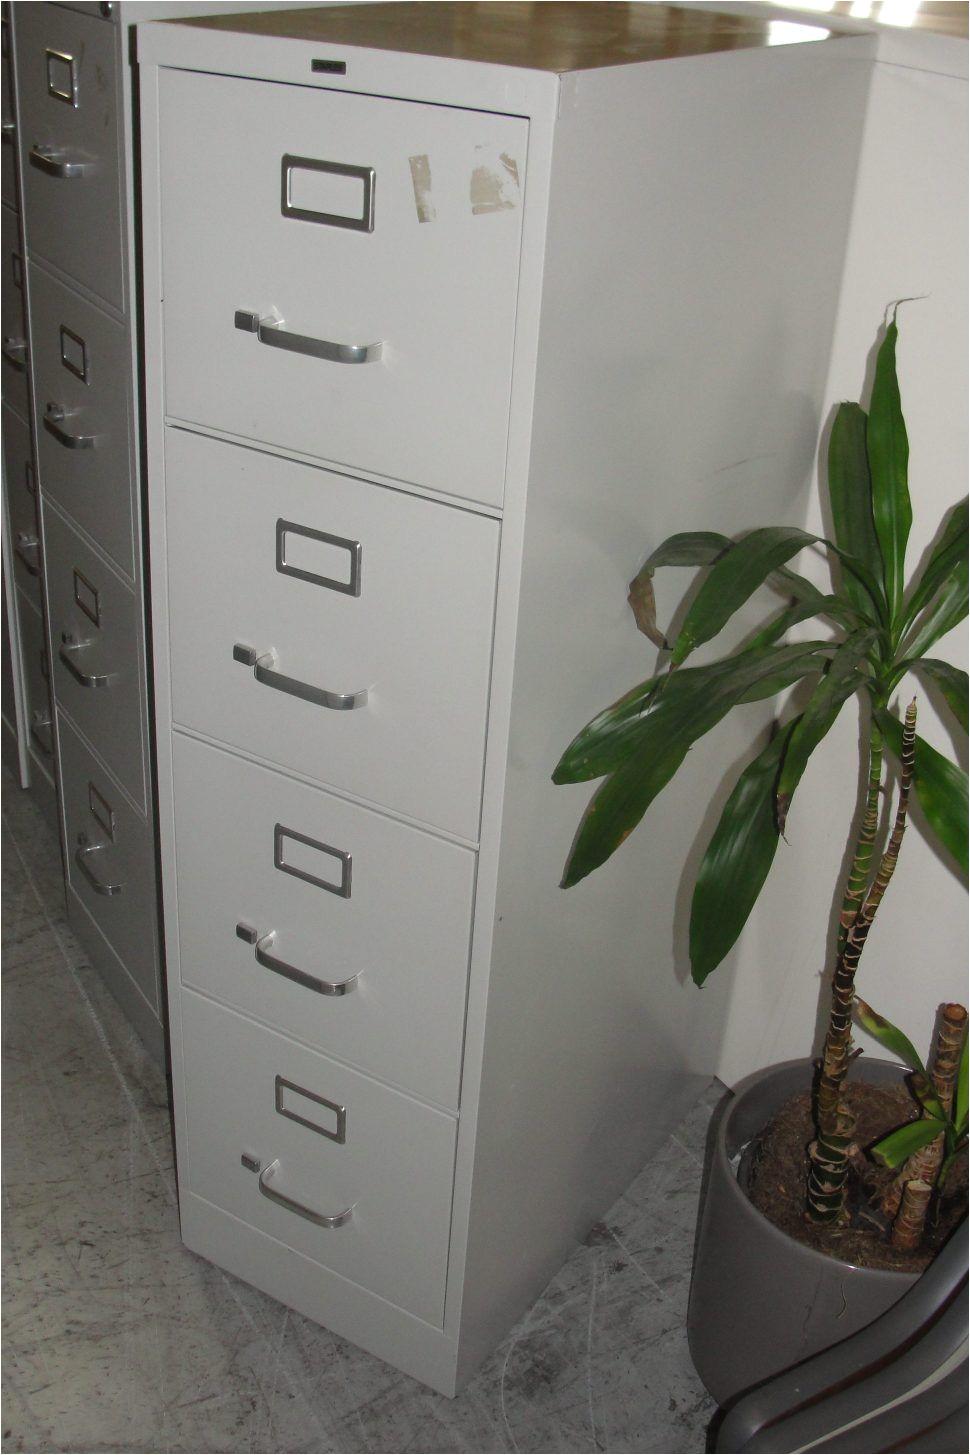 officemax filing cabinet keys